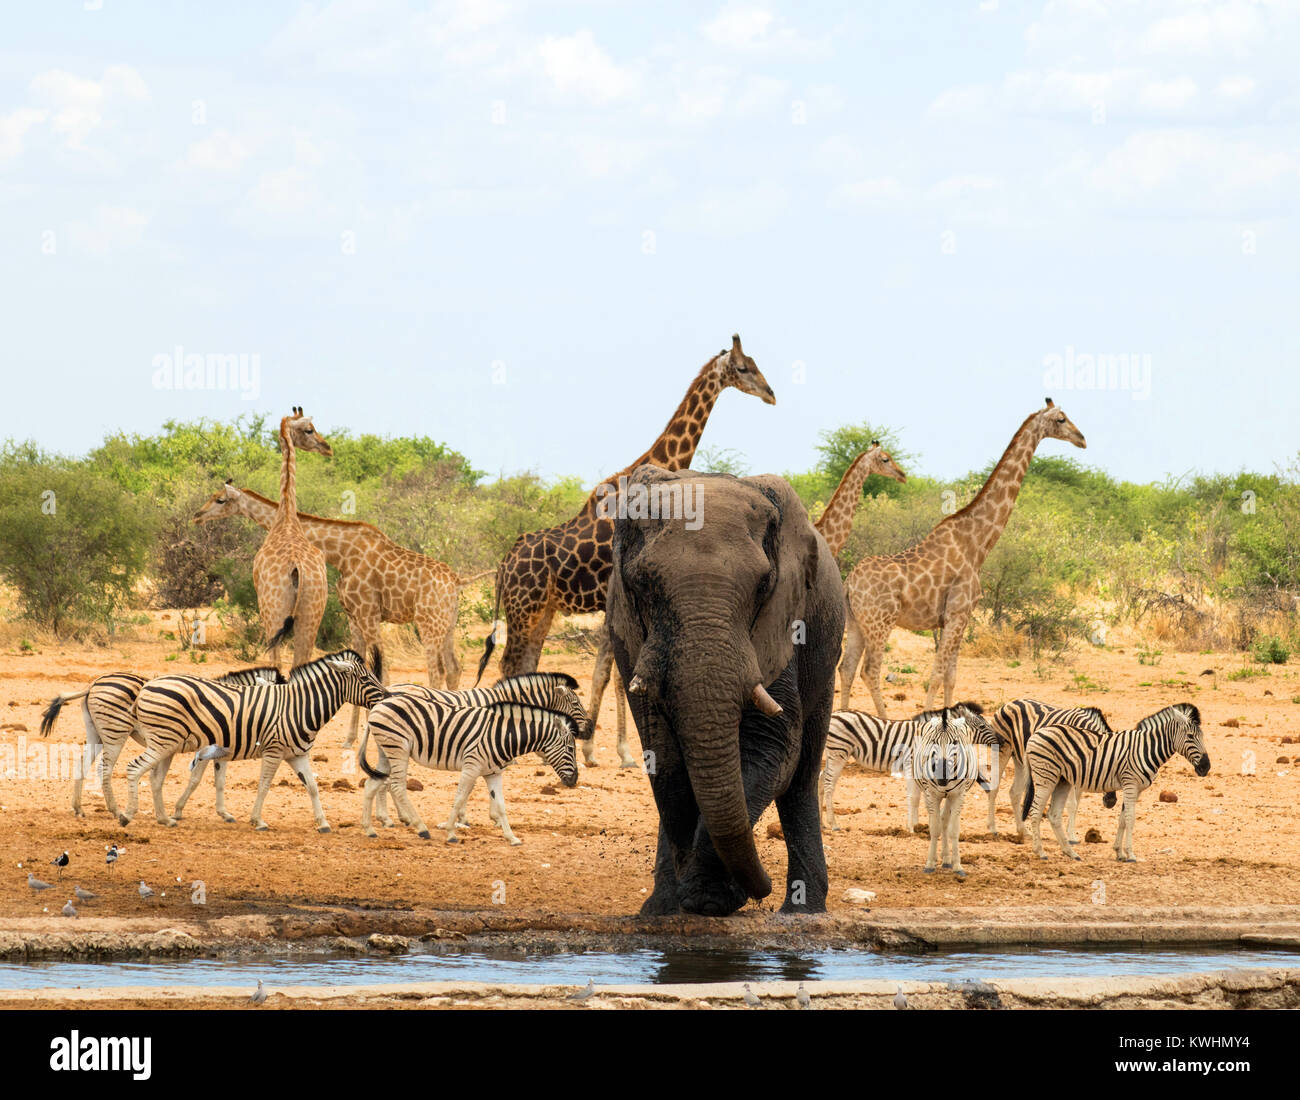 Waterhole Animals Zebra Giraffe Stock Photos Amp Waterhole